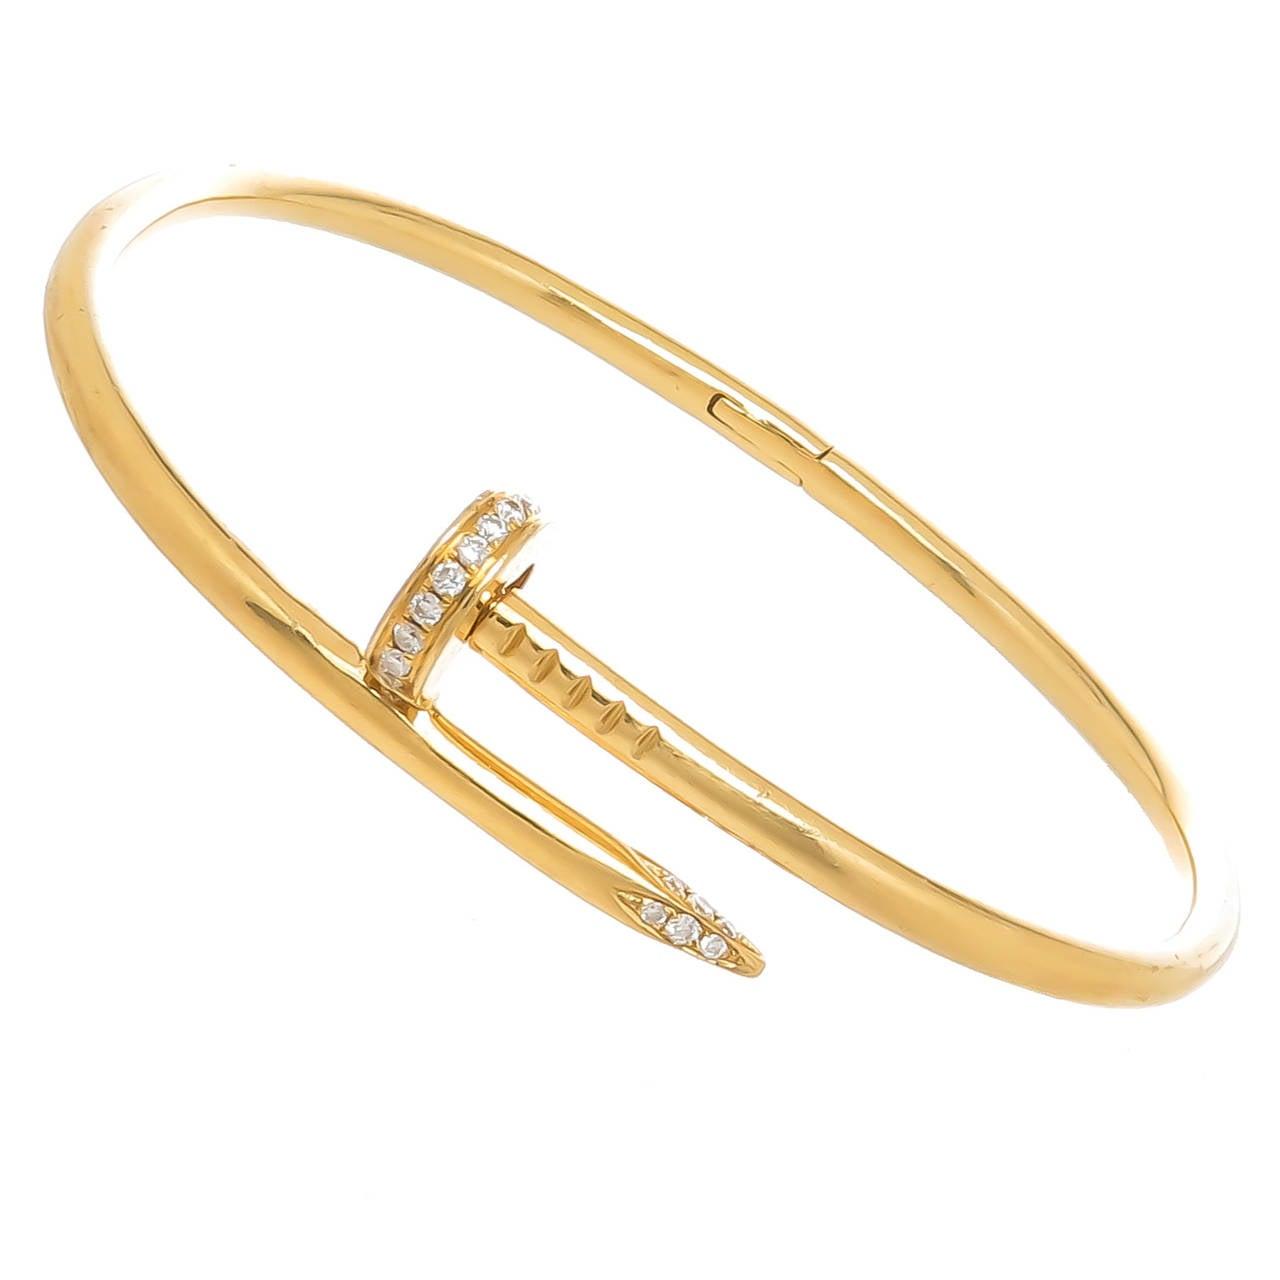 Gold ring price in bangalore dating 6